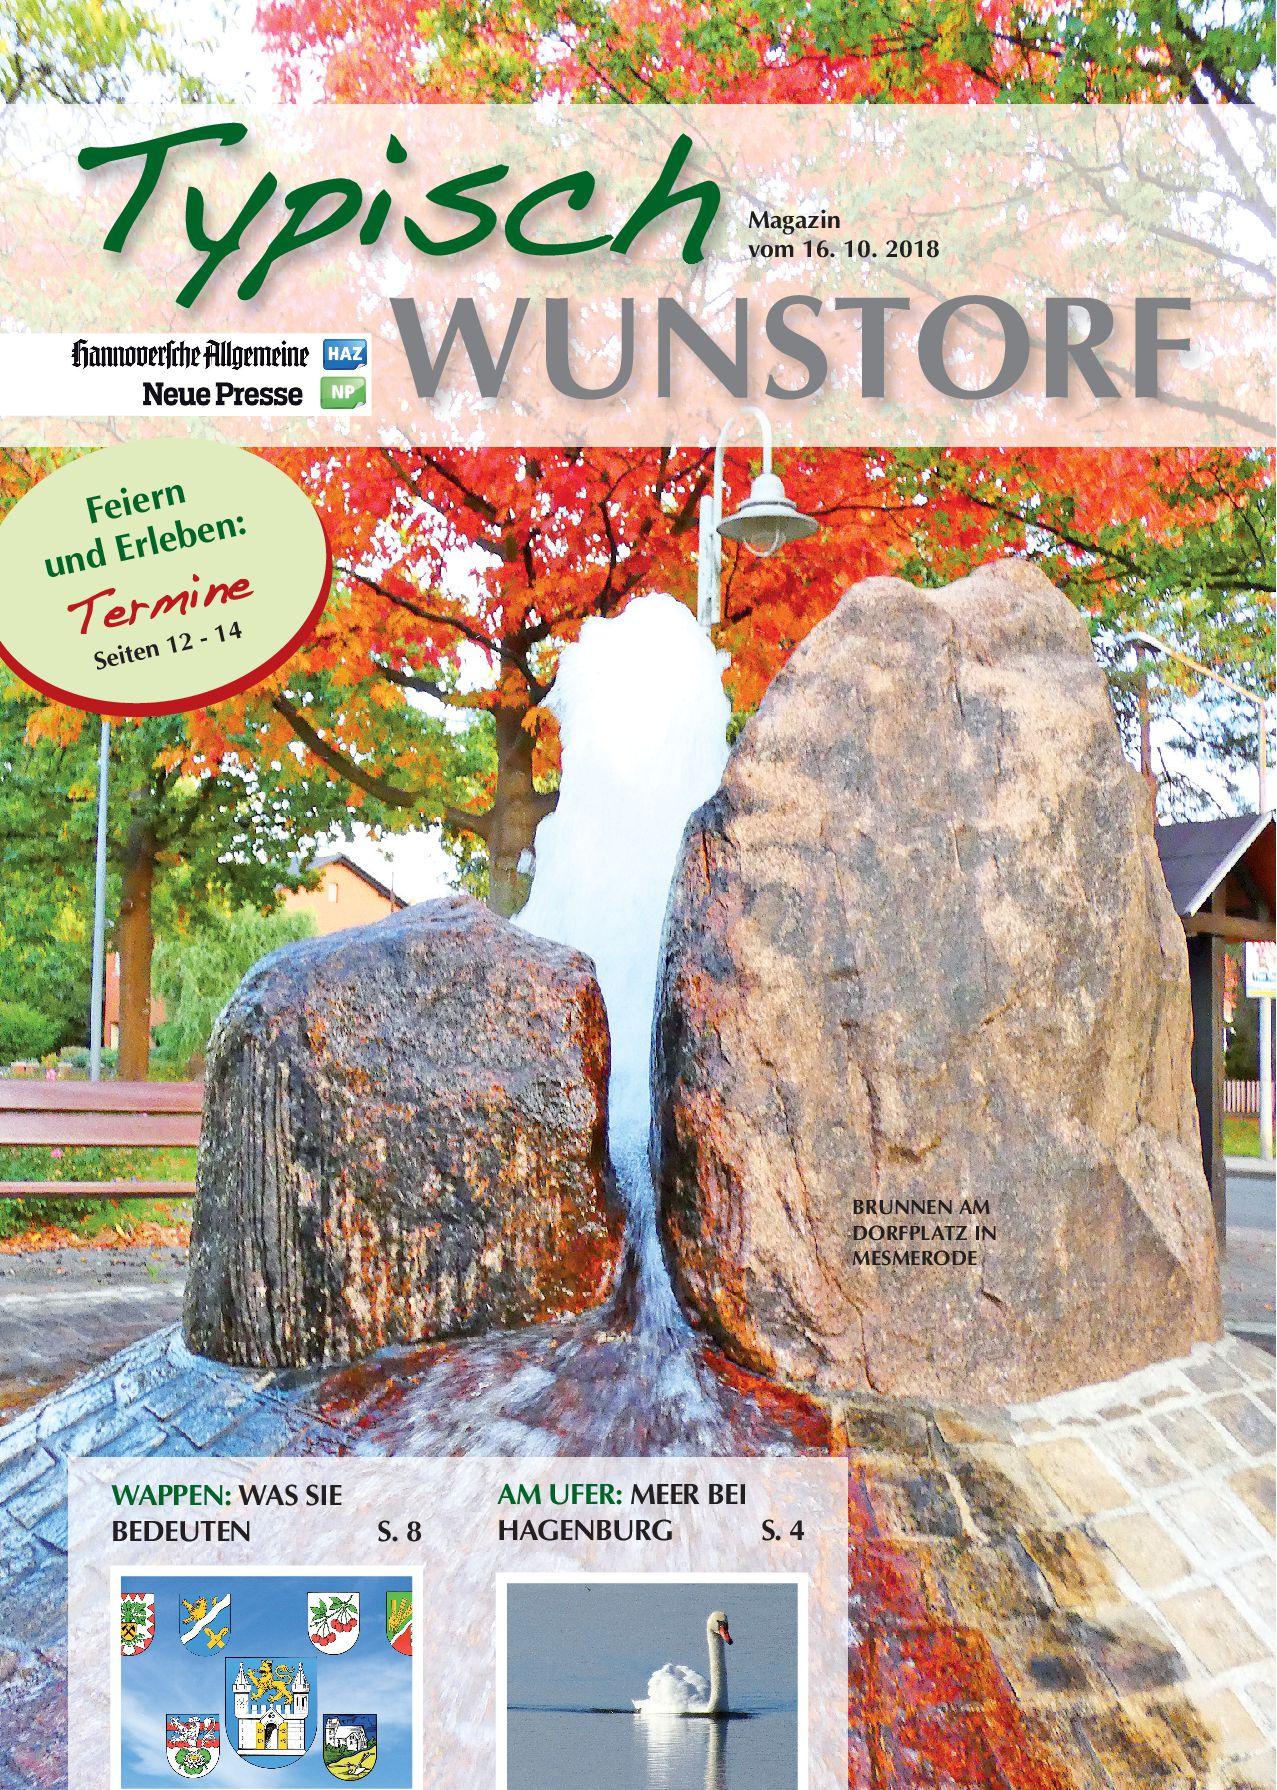 wunstorf-vom-16-10-2018